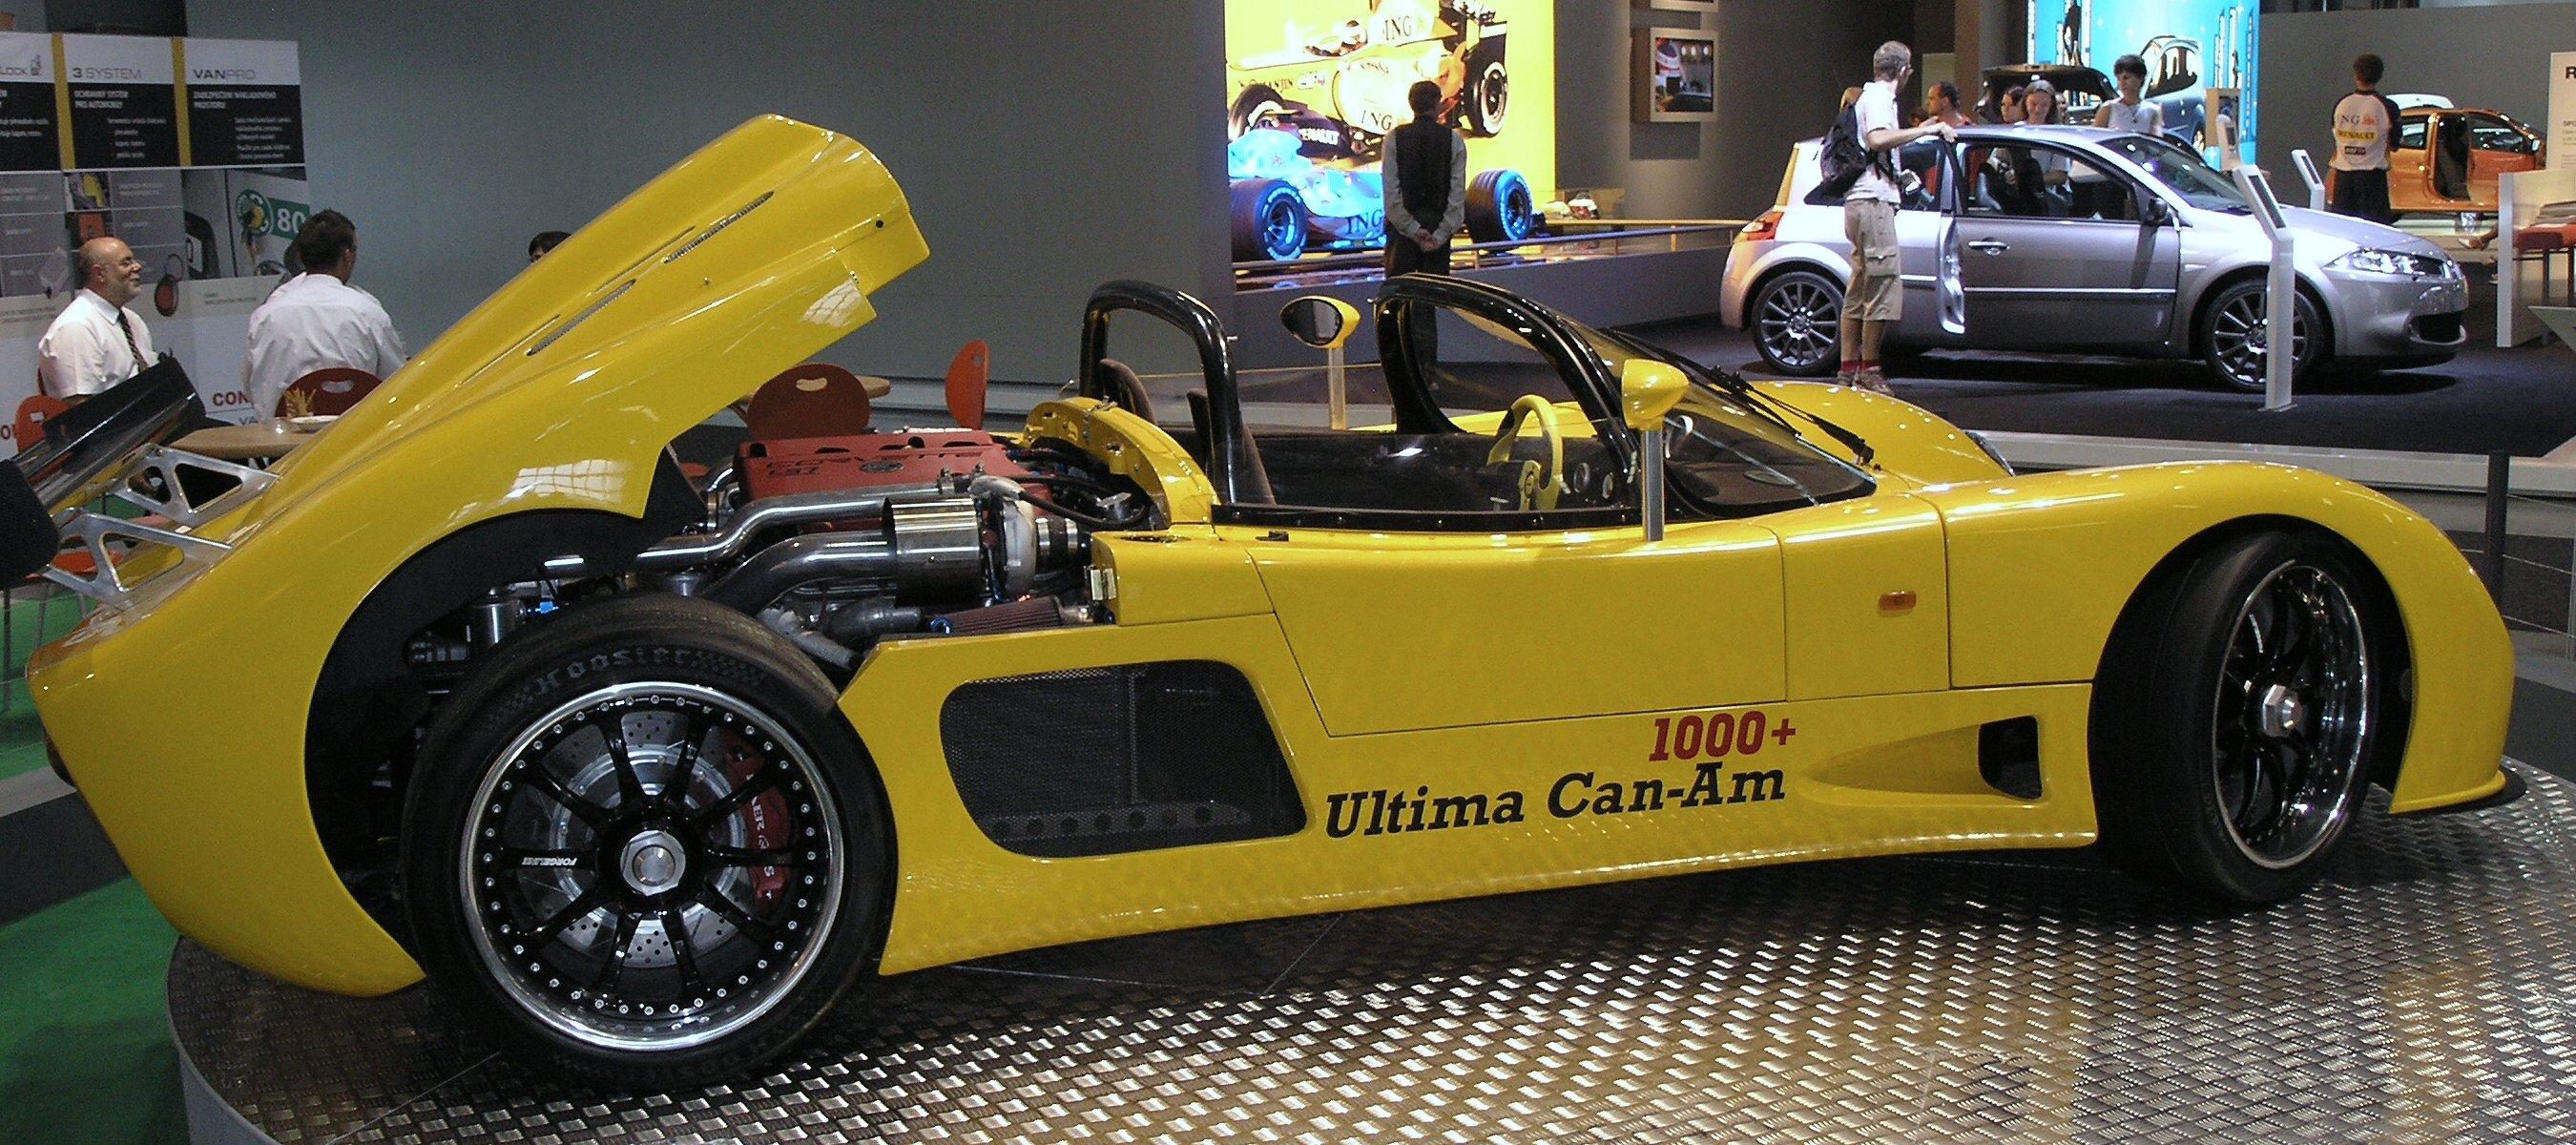 can am lemans le mans grand prix race racing supercar canam wallpaper 2700x1200 835641. Black Bedroom Furniture Sets. Home Design Ideas